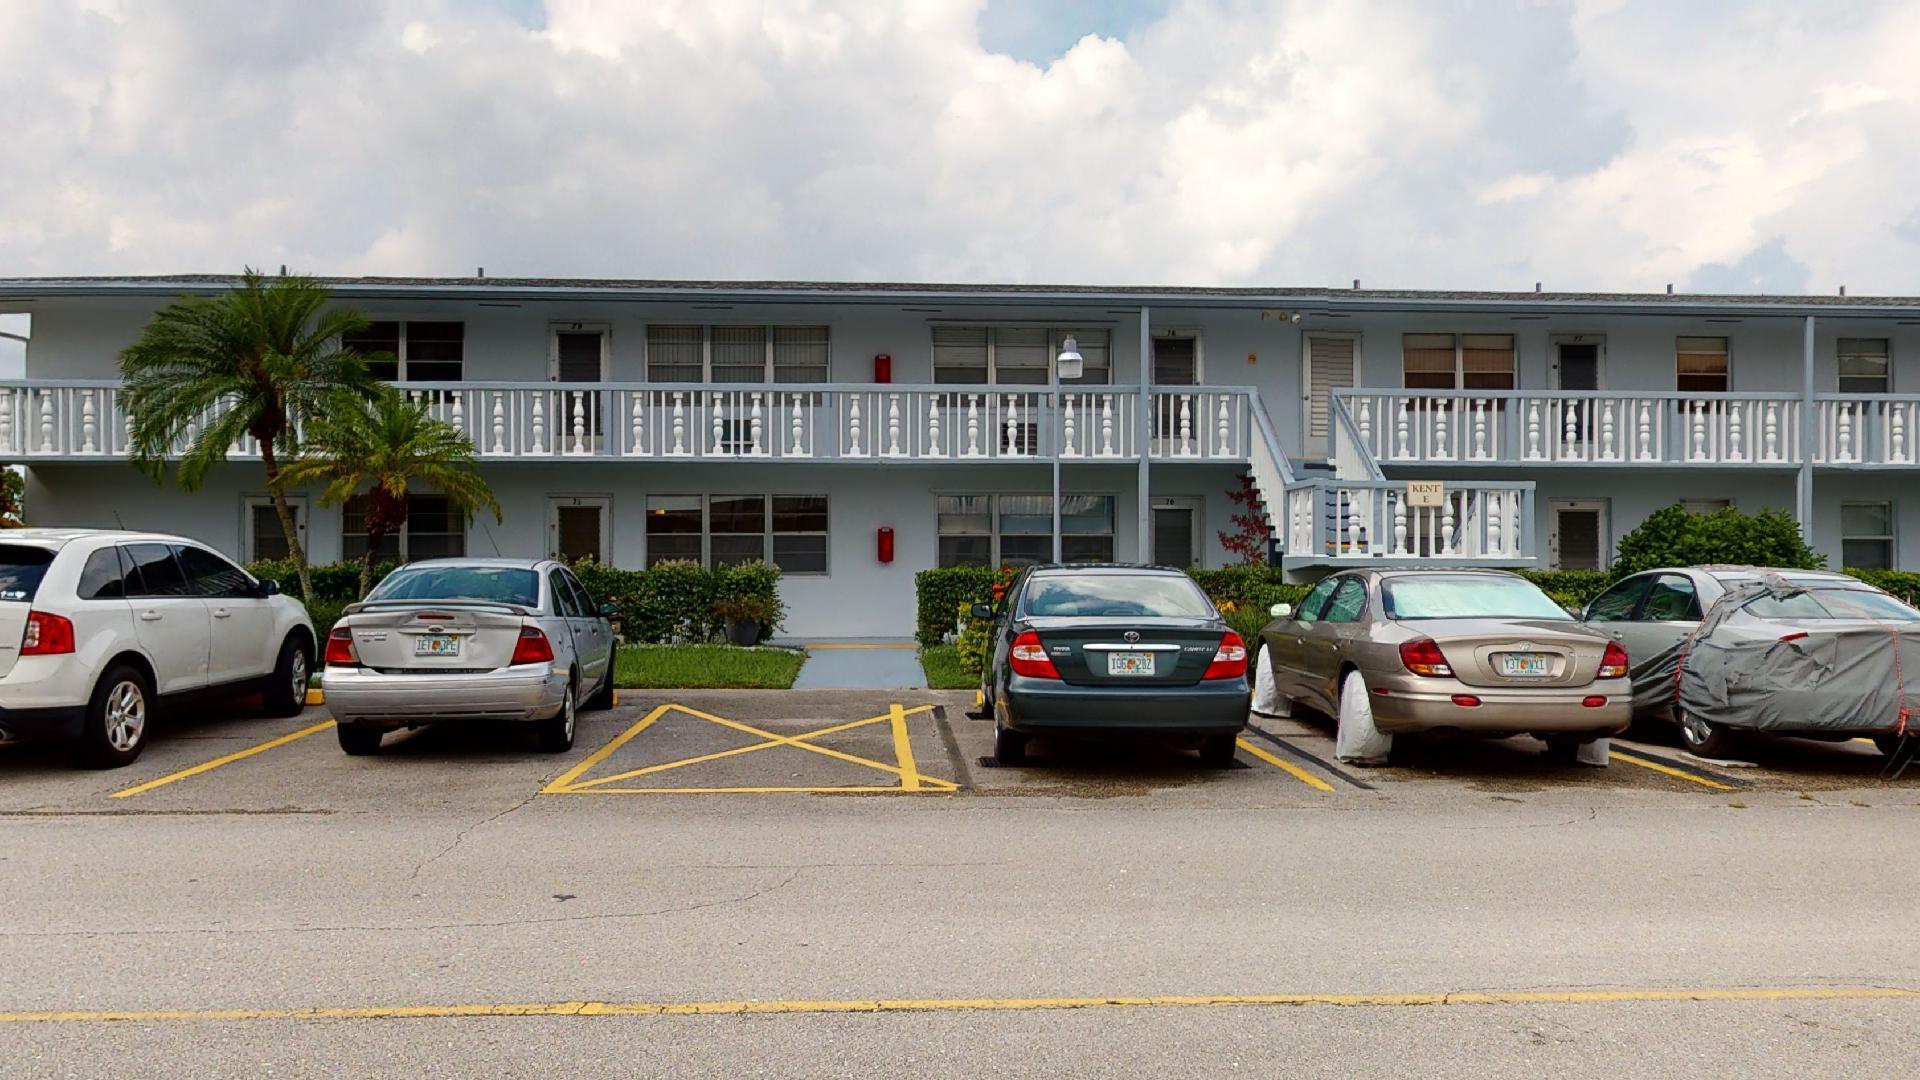 71 Kent E, West Palm Beach, FL 33480